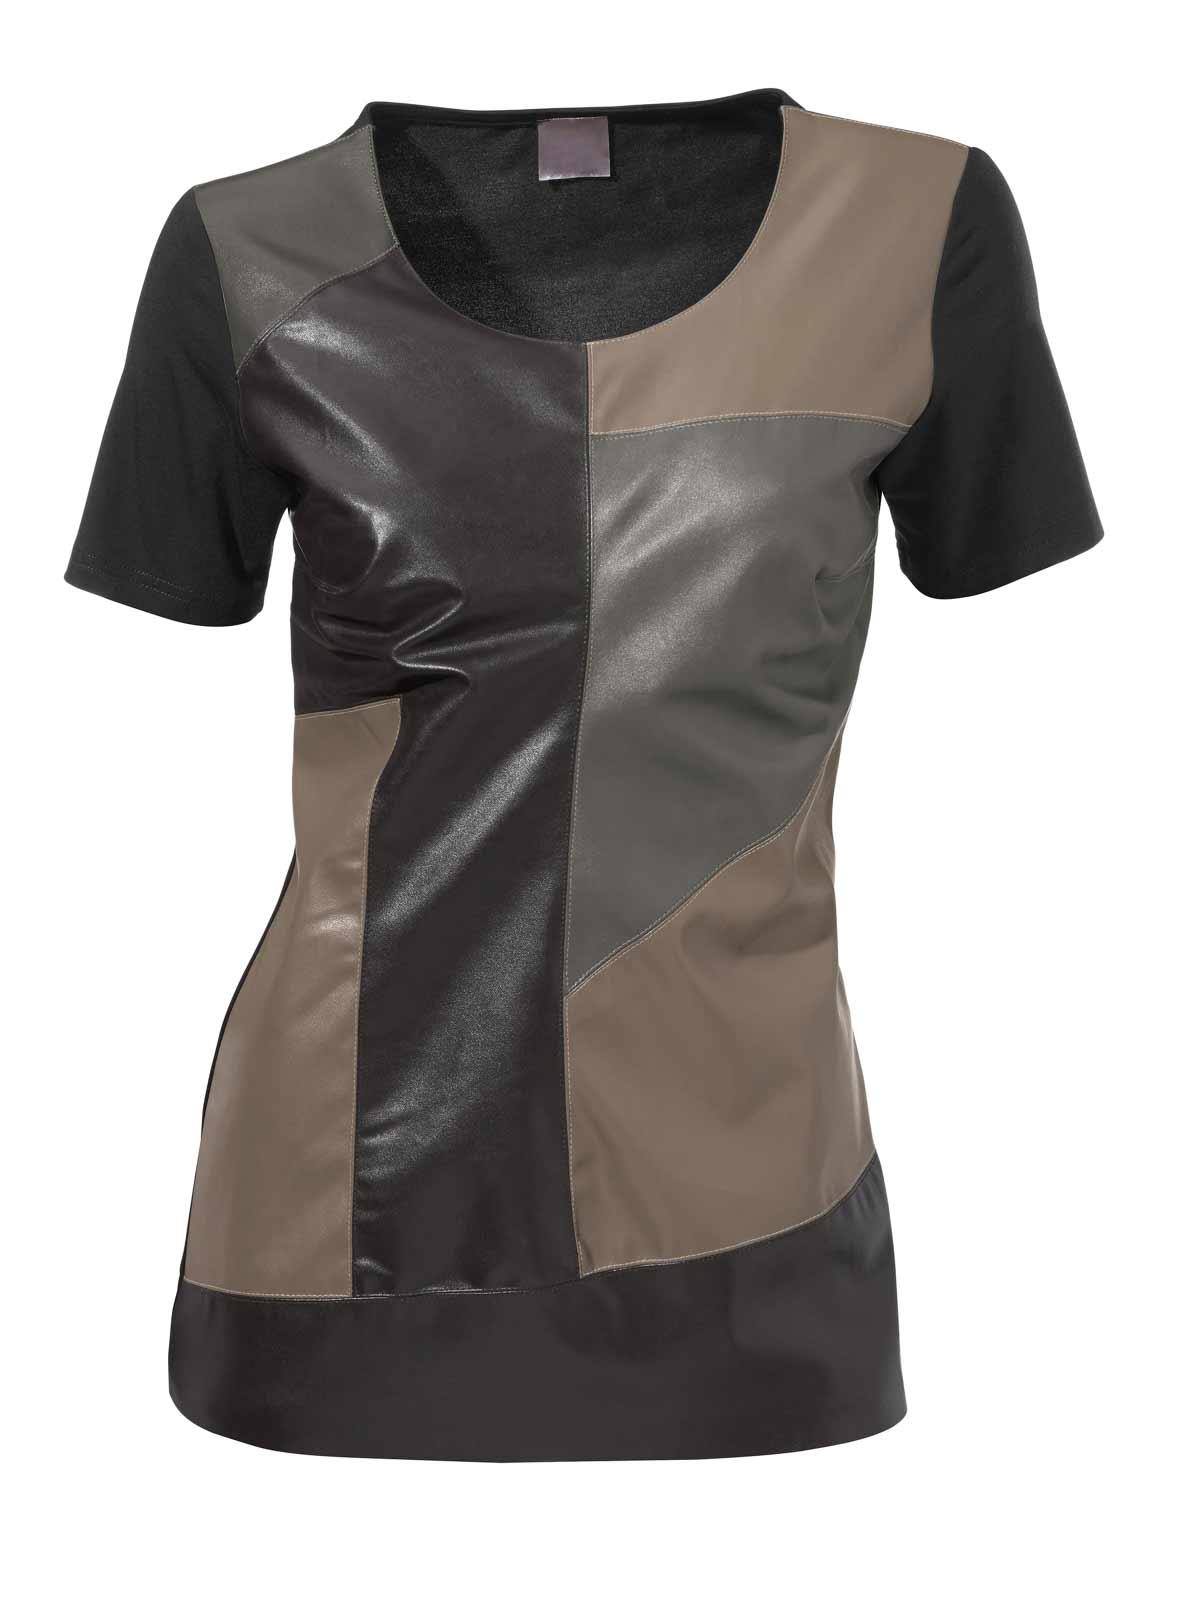 029.374 RICK CARDONA Damen Designer-Lederimitat-Shirt Schwarz-Taupe